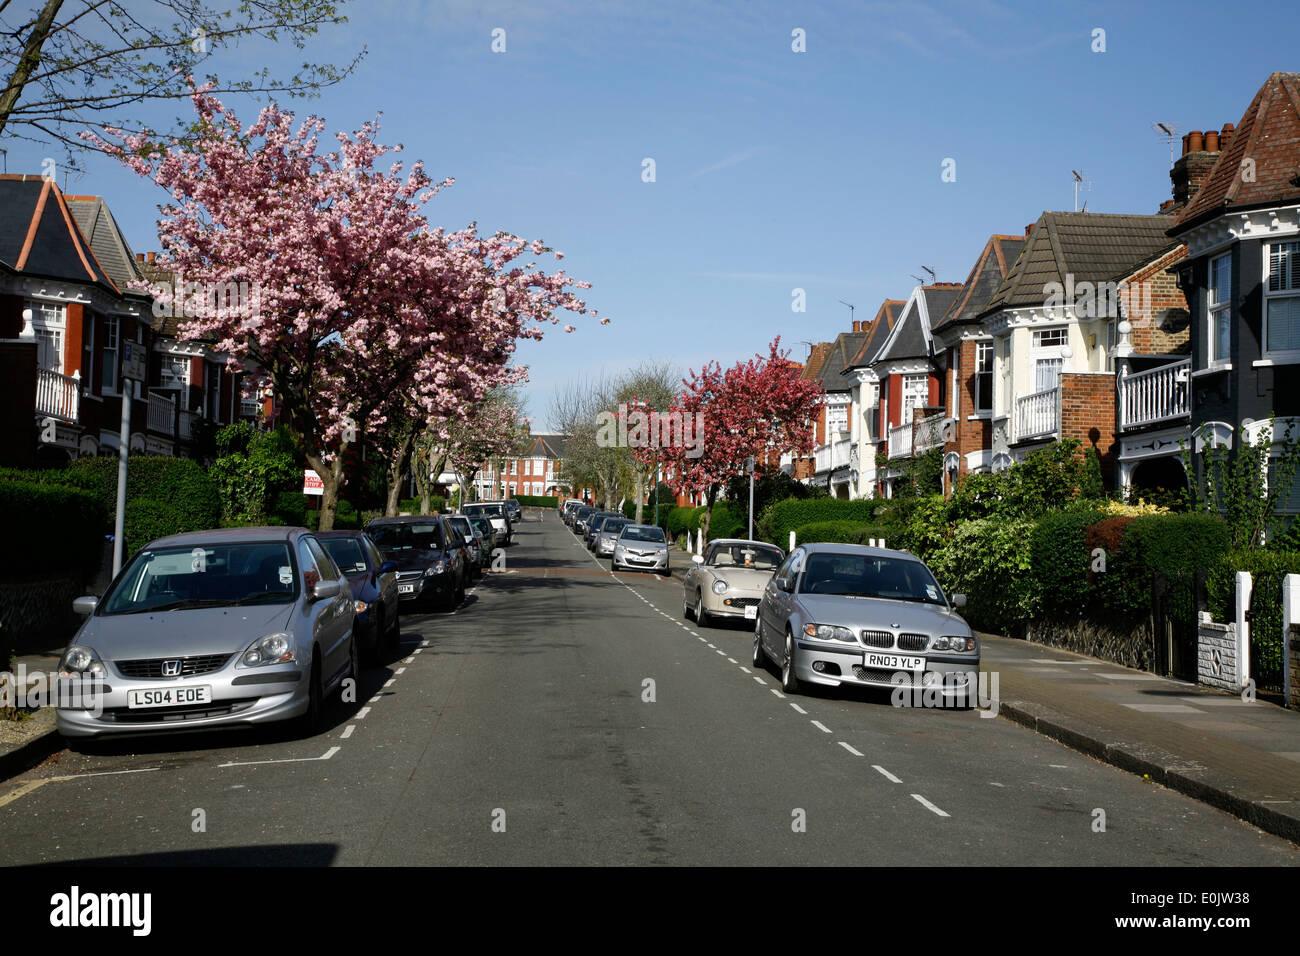 Dewsbury Road, Dollis Hill, London, UK - Stock Image